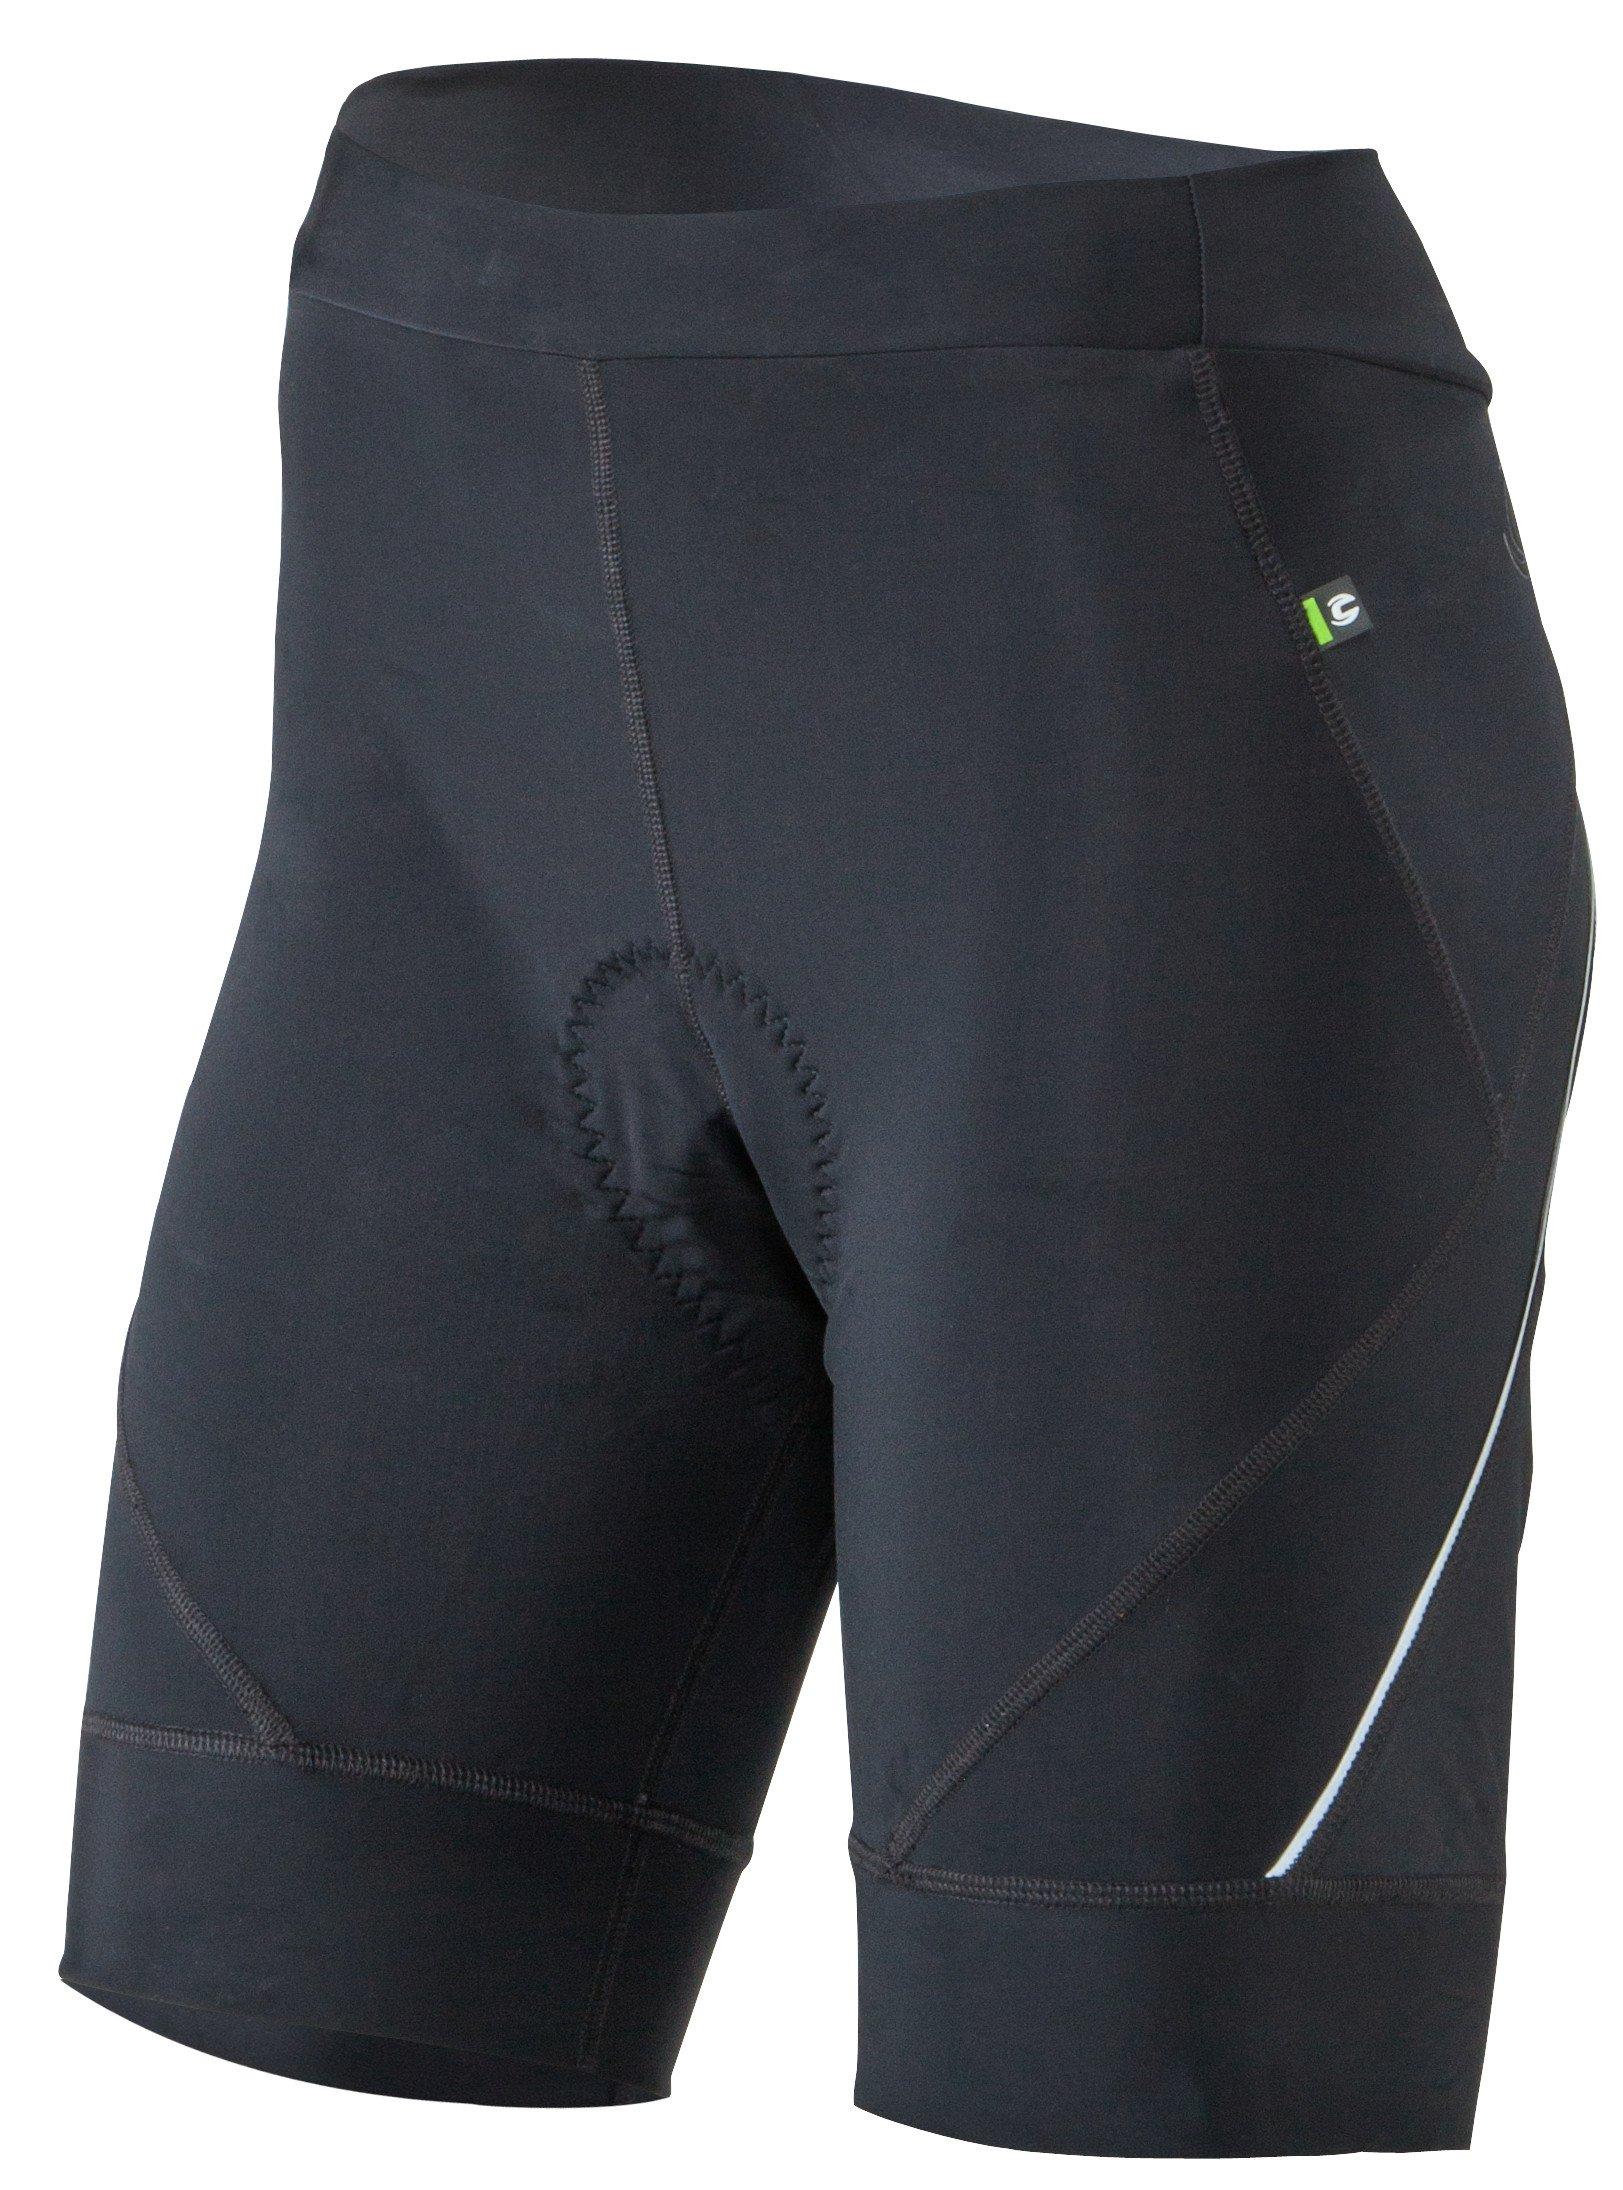 Cannondale Women's Elite Shorts, Black, Large